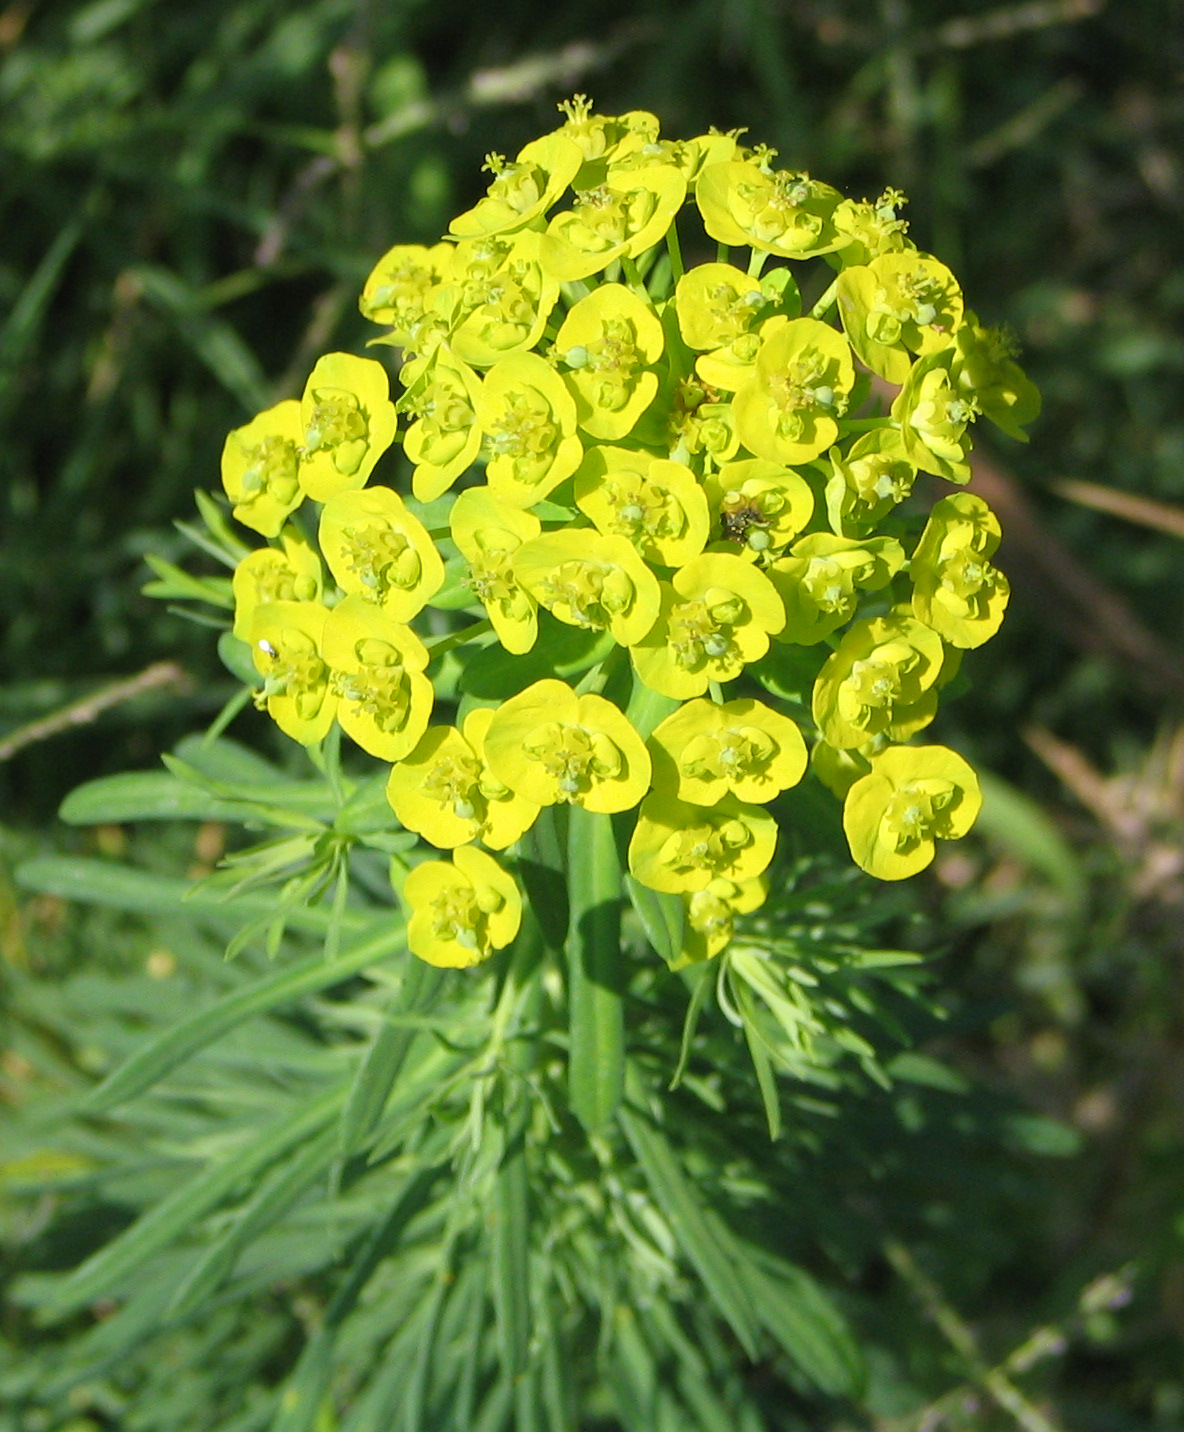 File:Euphorbia cyparissias 02 bgiu.jpg - Wikipedia